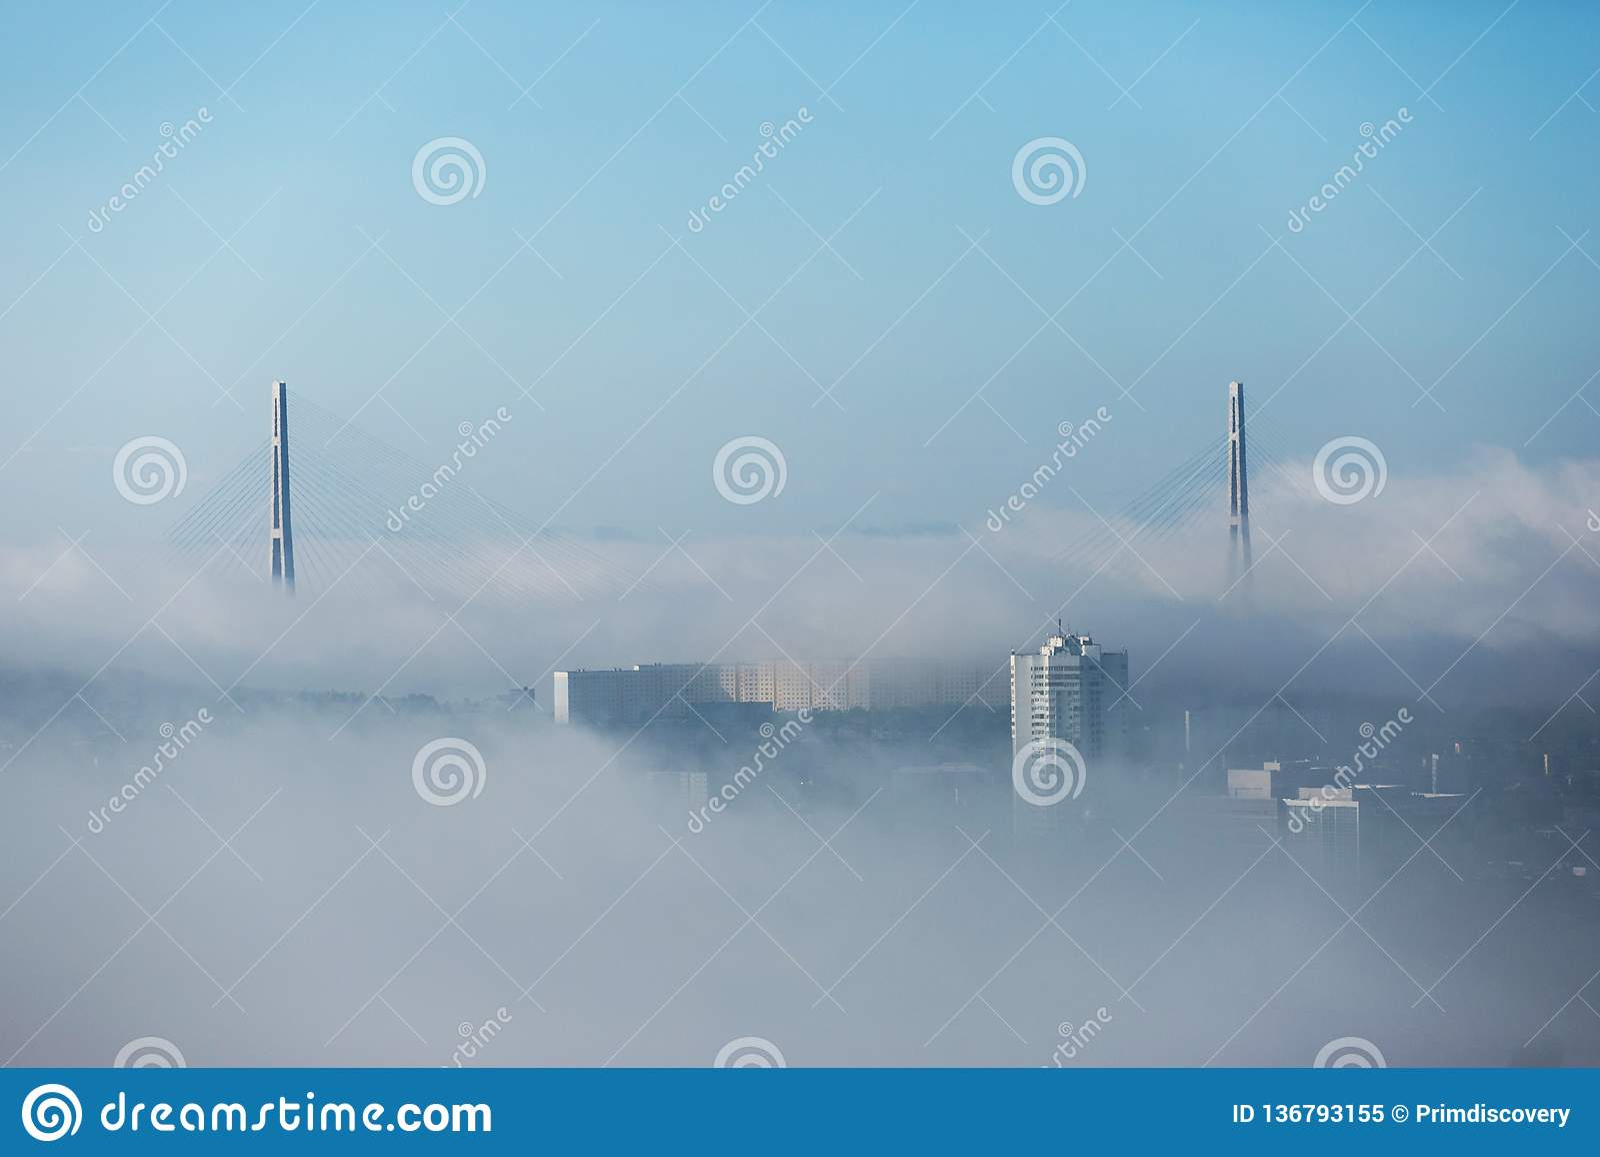 Tuman在符拉迪沃斯托克  在雾掩藏的俄国和金黄桥梁的定向塔